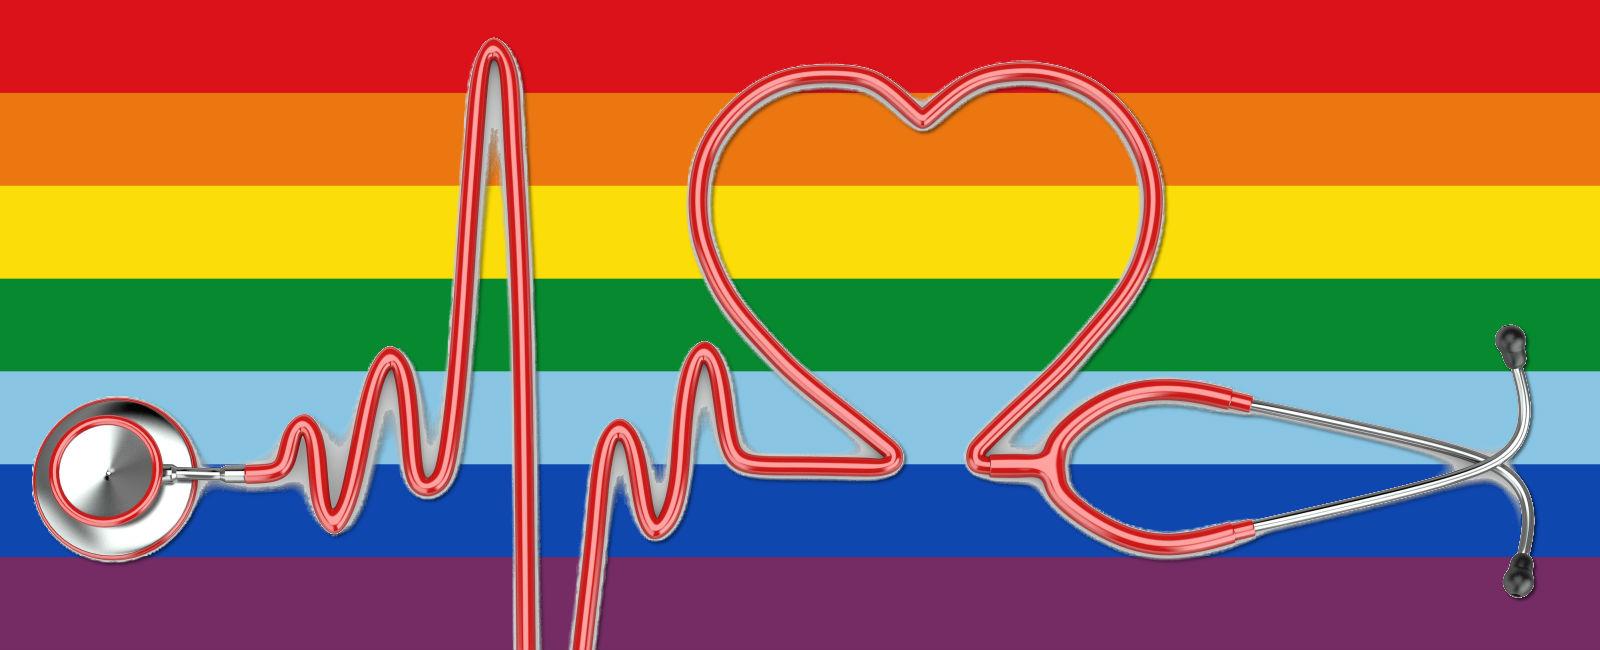 img-gay-health-01.jpg